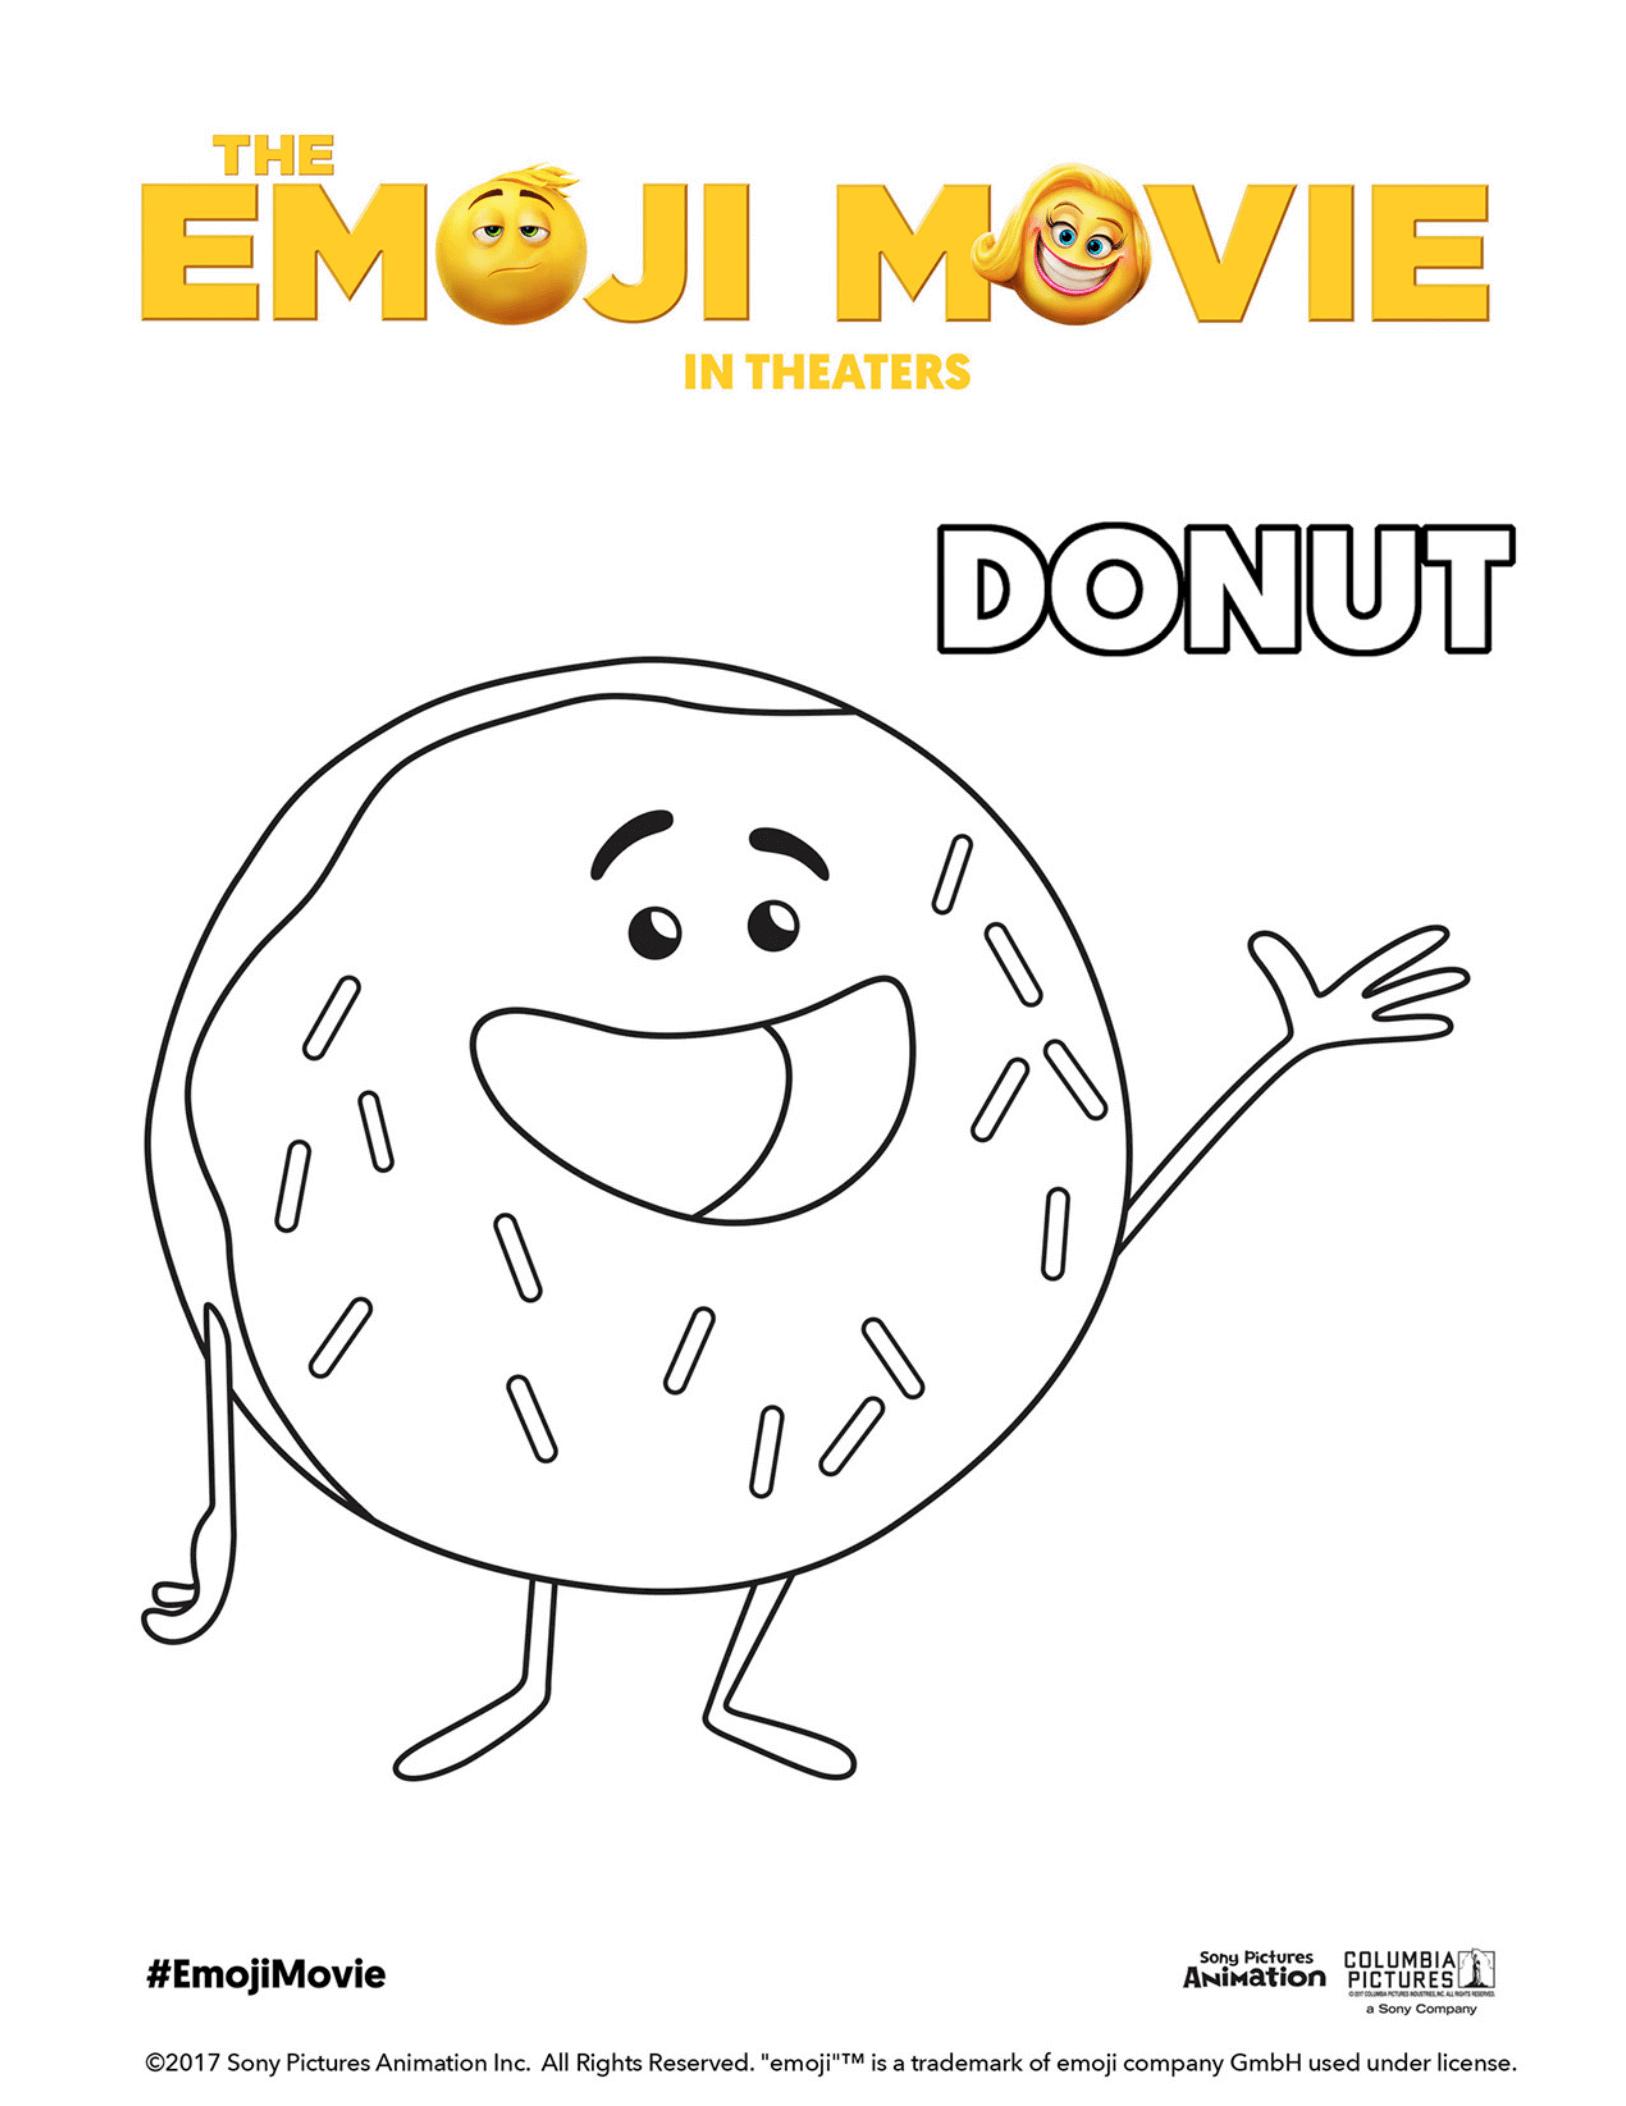 The Emoji Movie Donut Coloring Page Emoji Coloring Pages Emoji Movie Coloring Pages